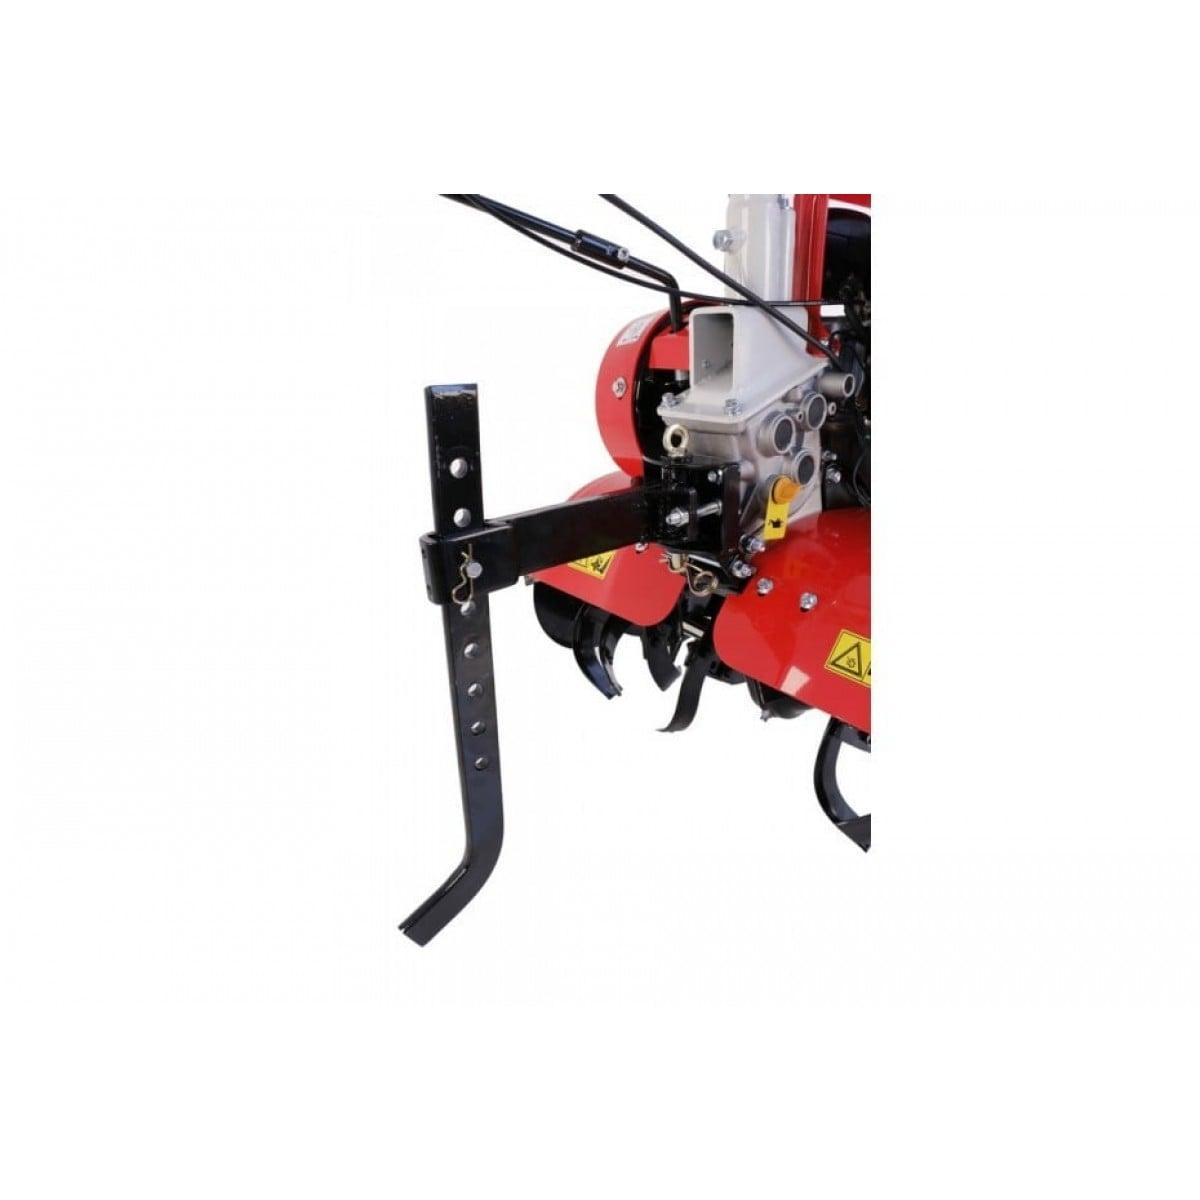 motocultor loncin lc750 7cp o mac.ro 6 2 94